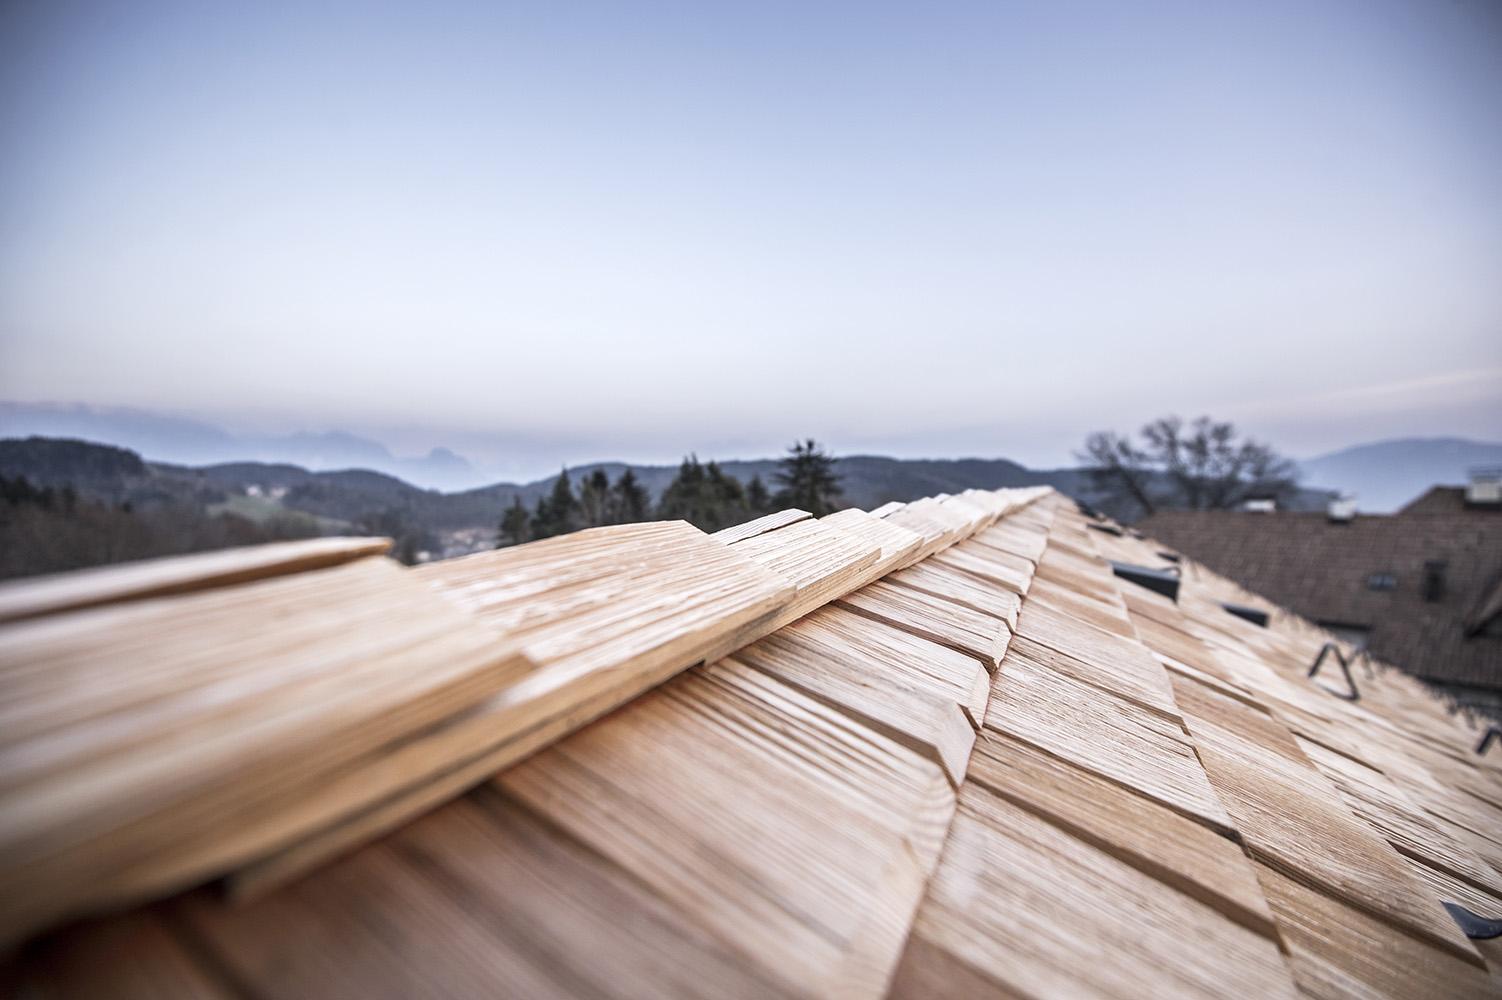 shingle roof & panorama